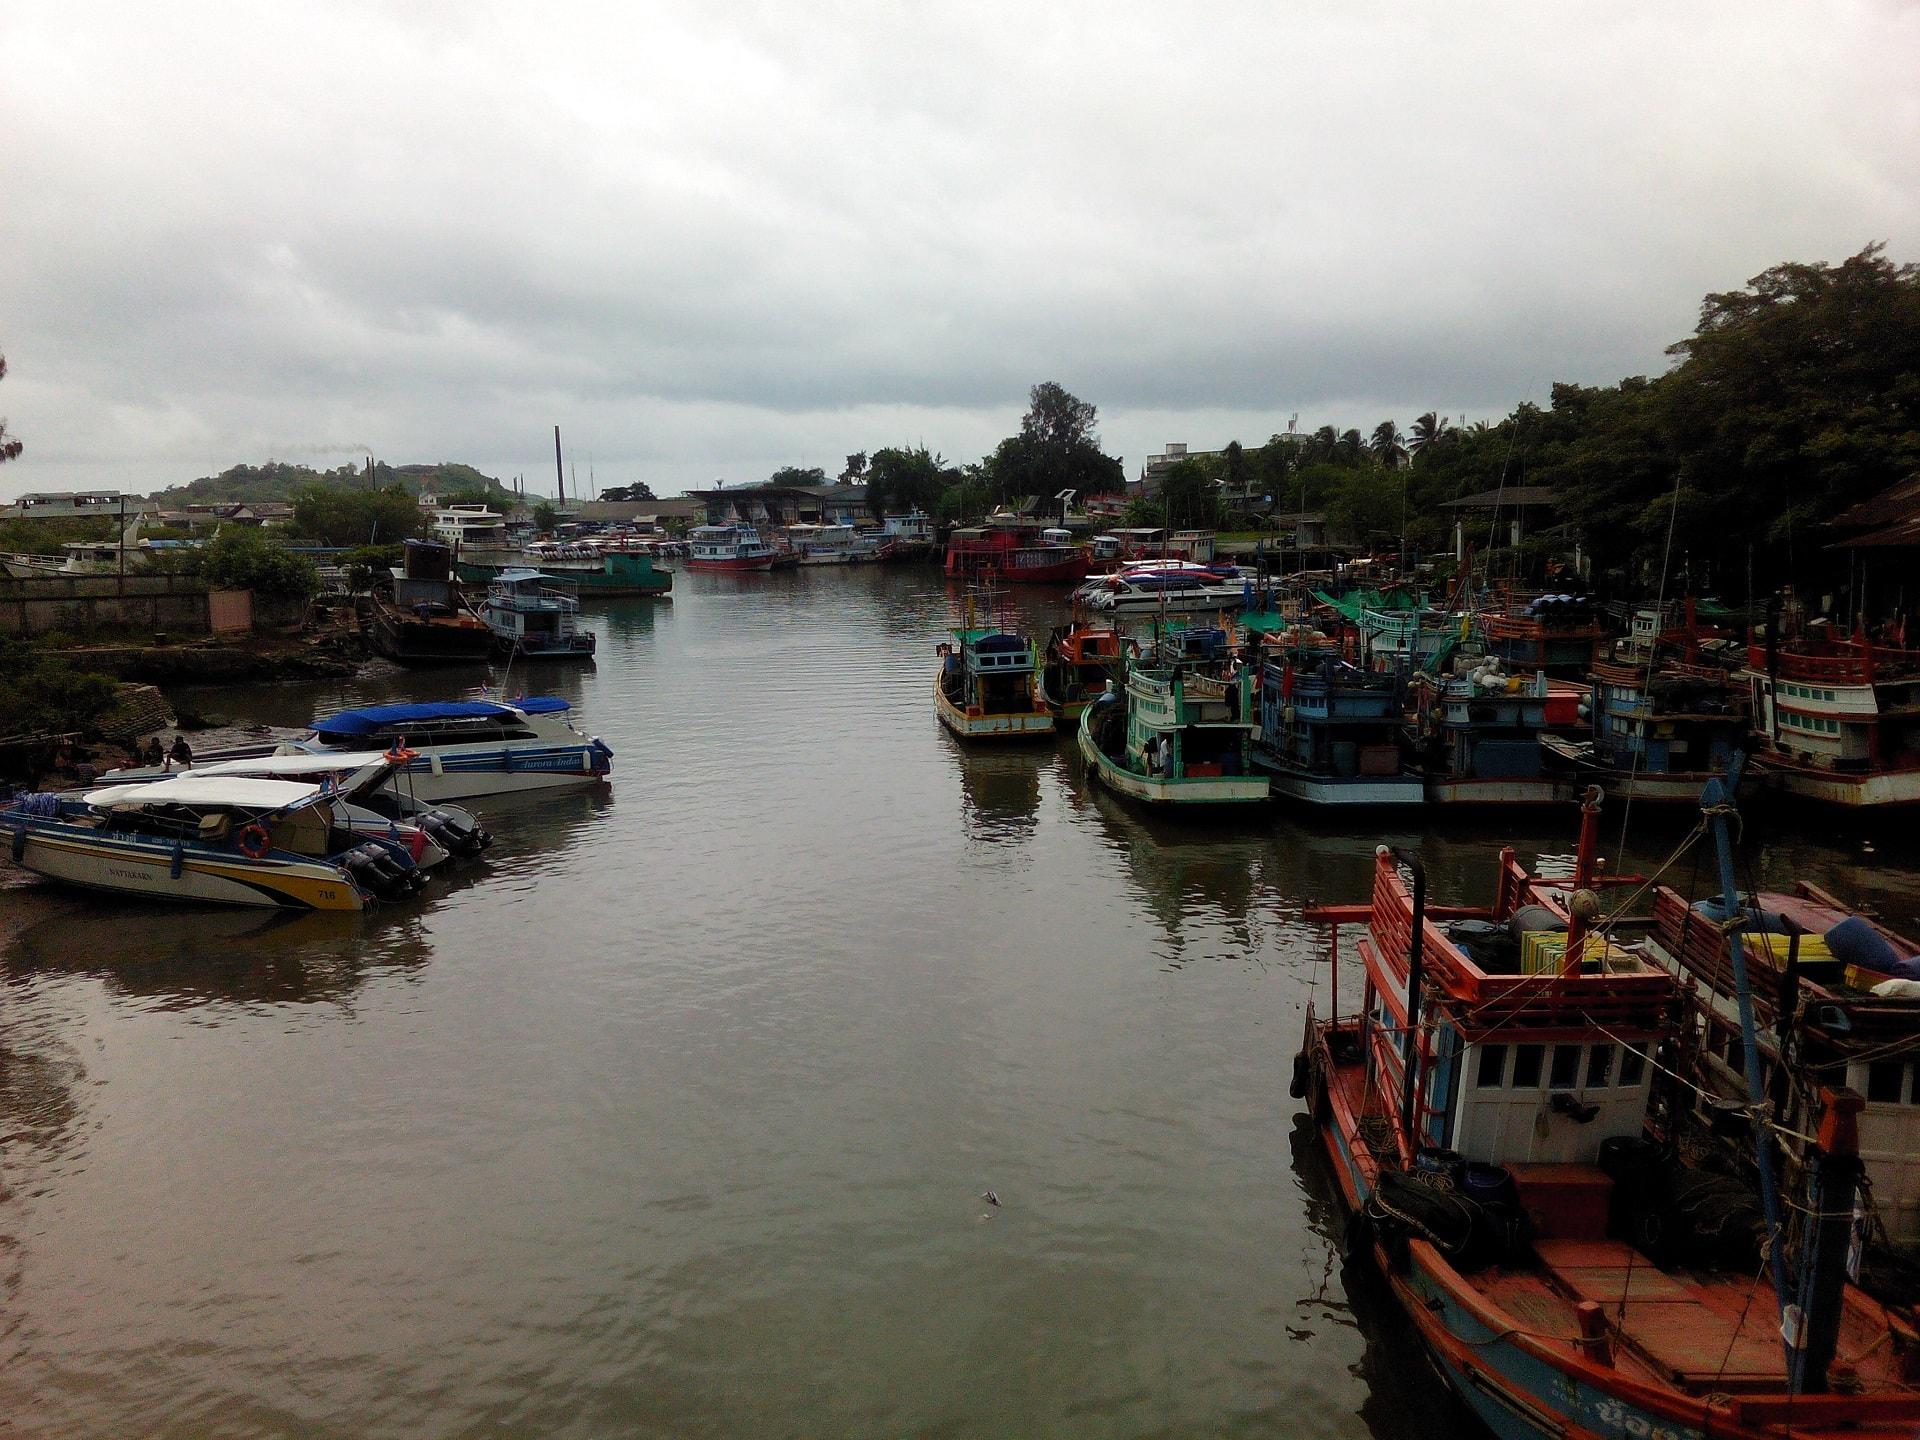 Koh Sirey Phuket